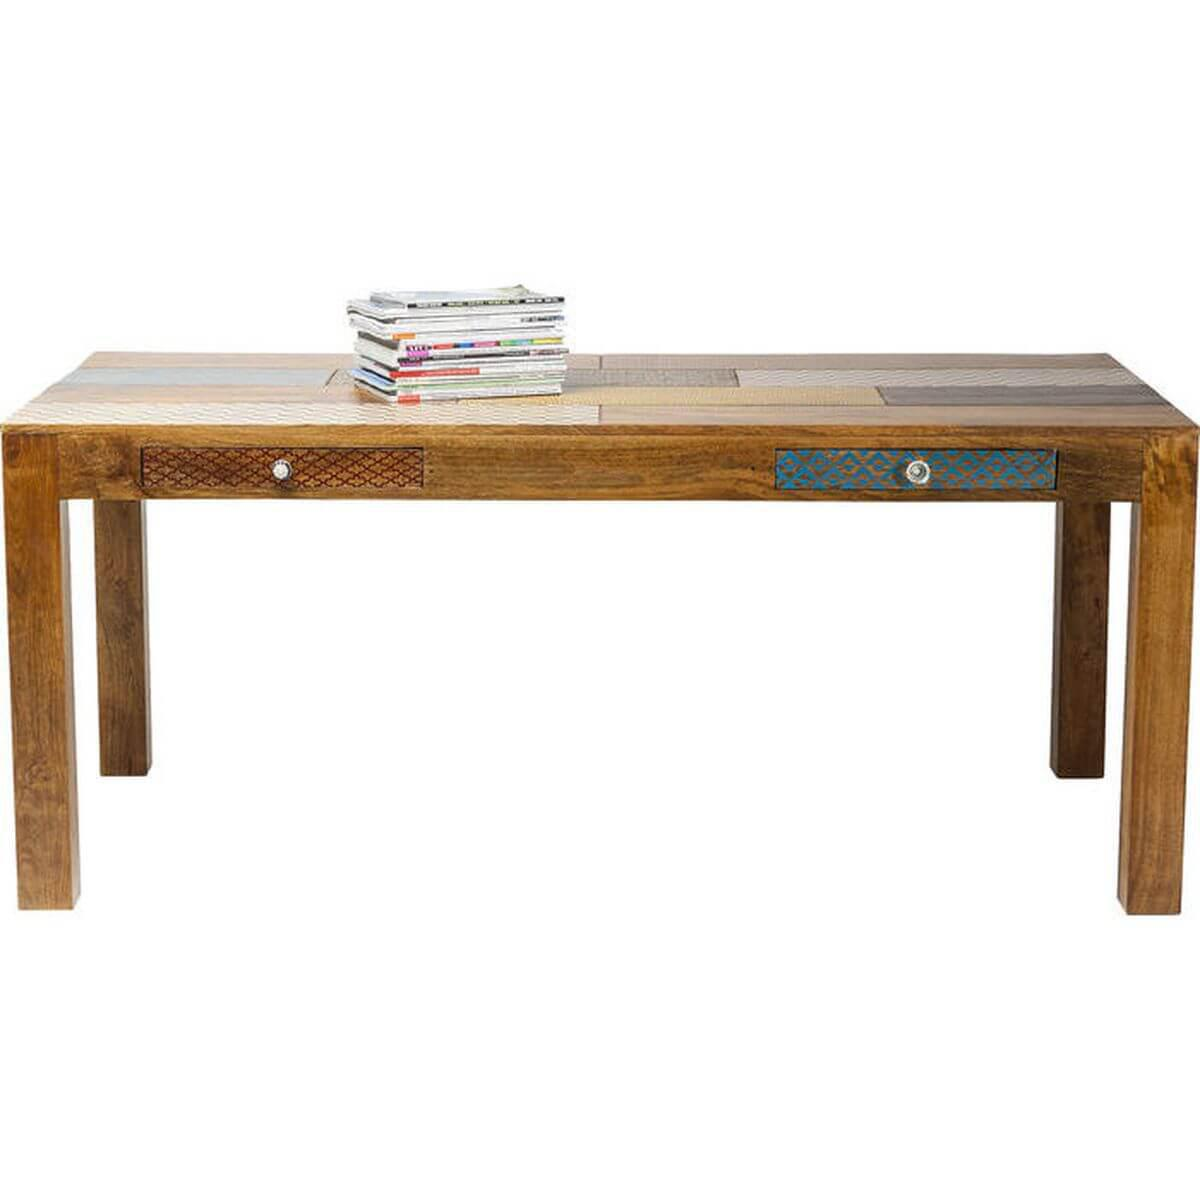 TABLE EN BOIS SOLEIL 180X90 CM 2 TIROIRS KARE DESIGN